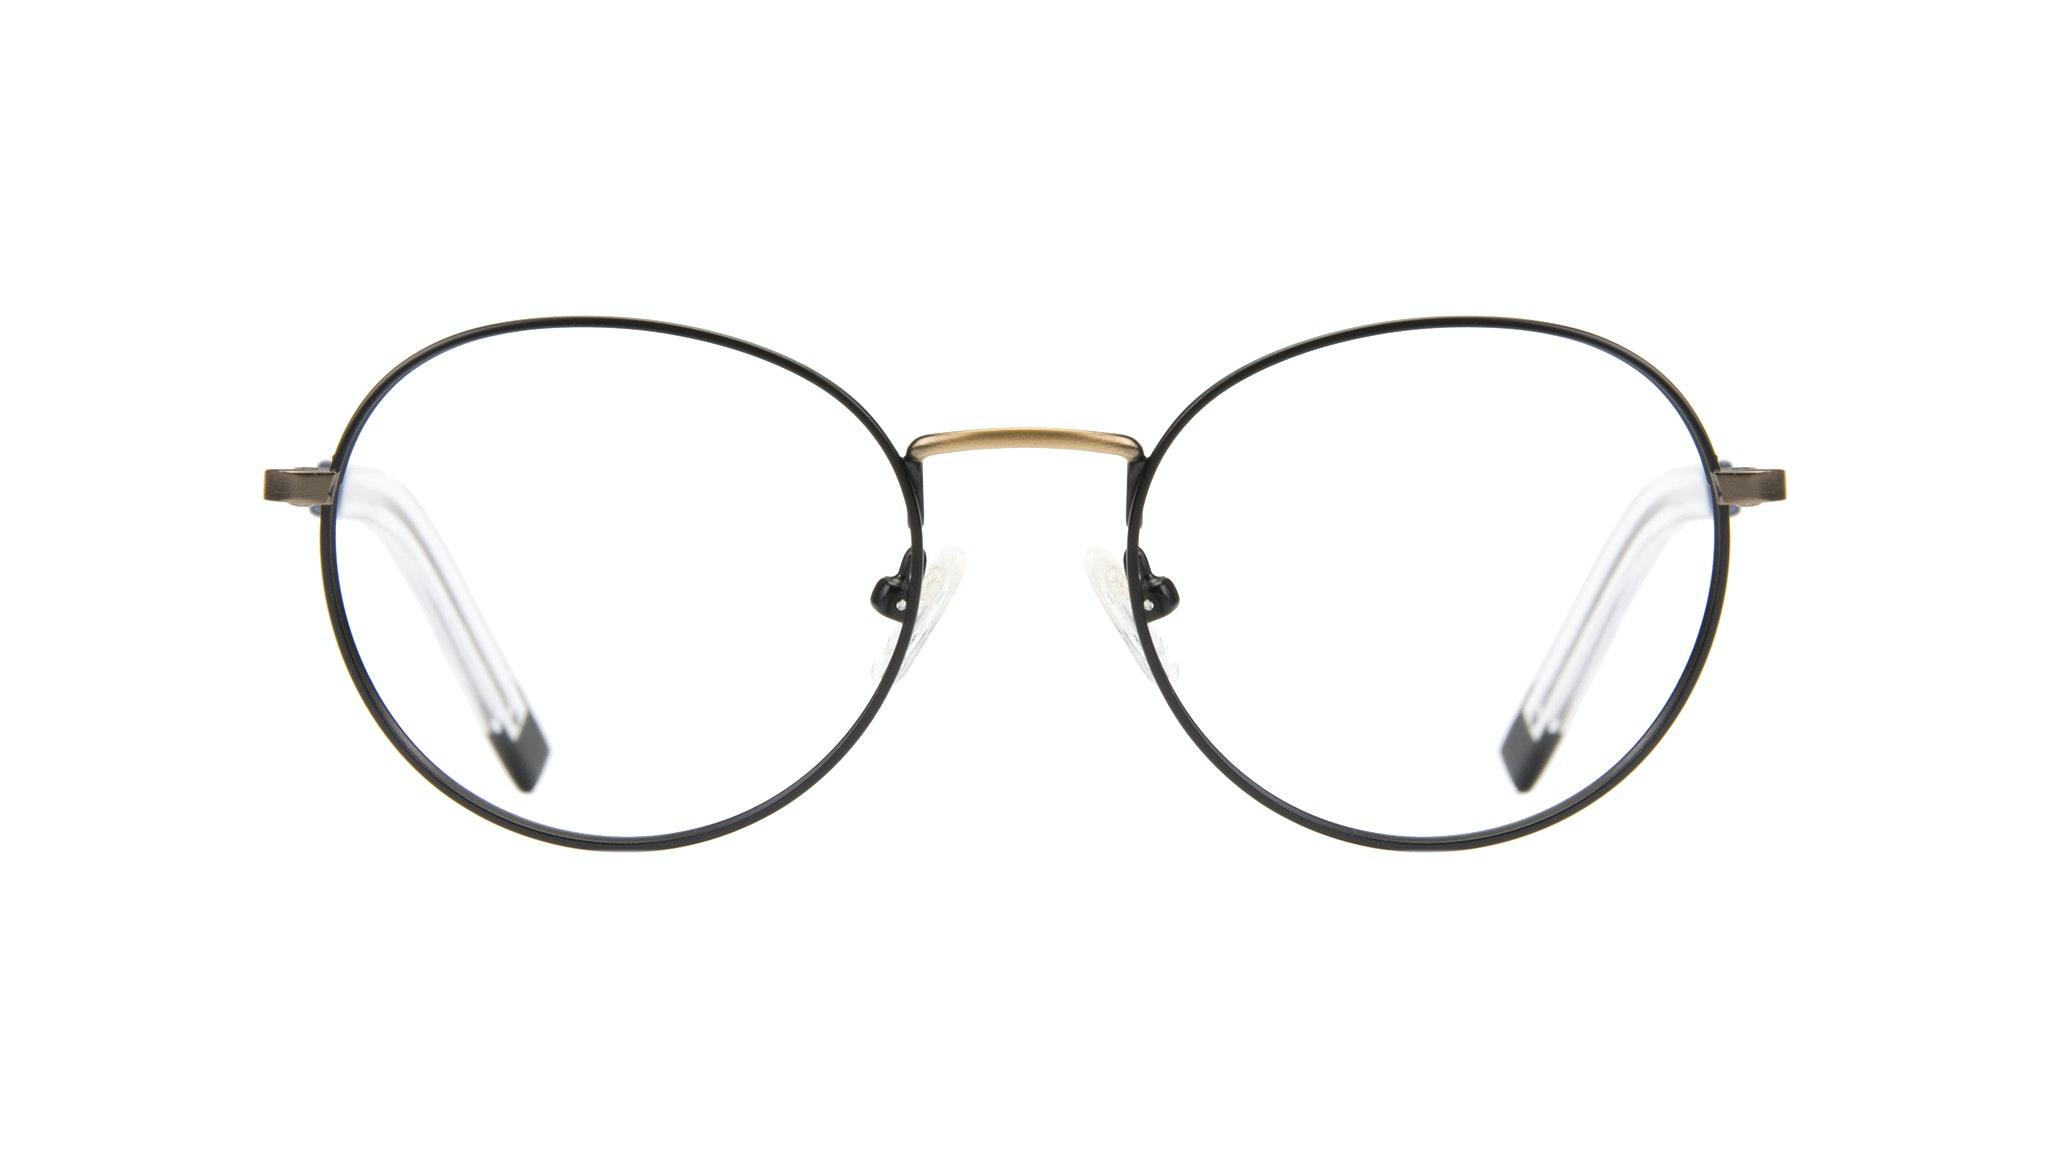 Affordable Fashion Glasses Round Eyeglasses Men Lean Dark Brass